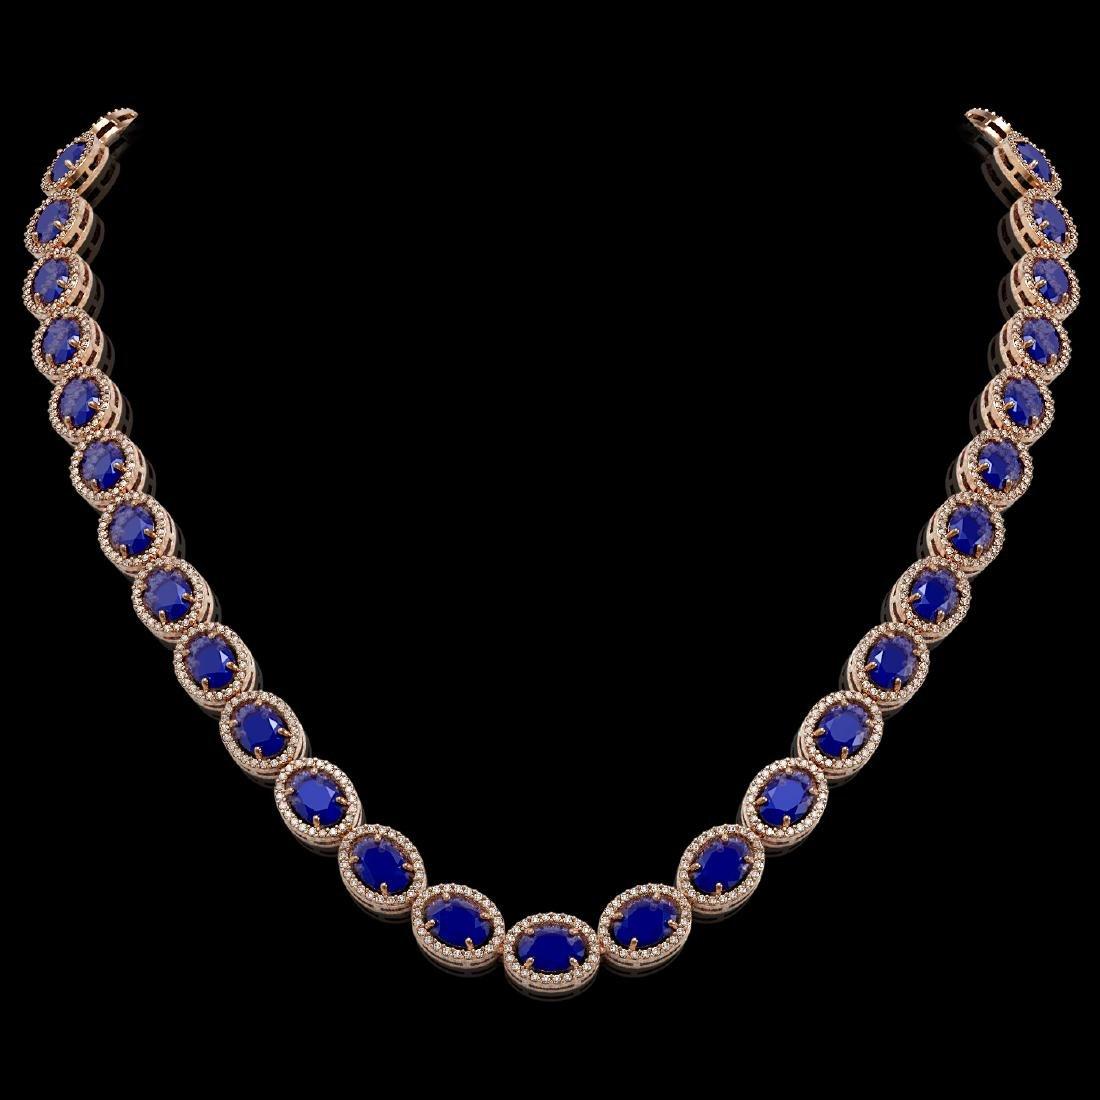 52.15 CTW Sapphire & Diamond Halo Necklace 10K Rose